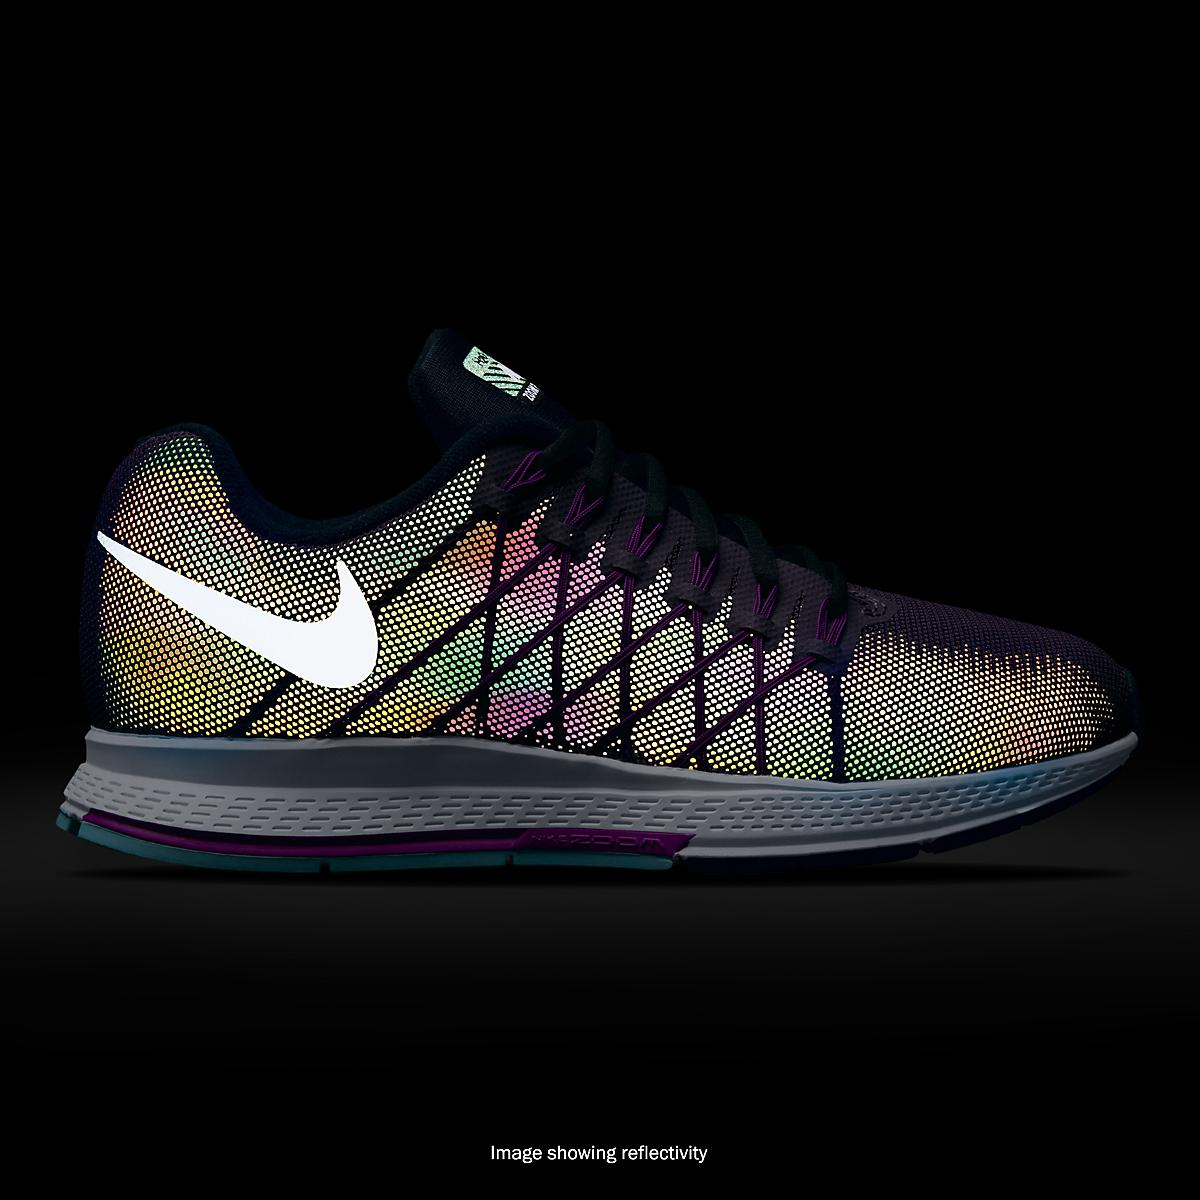 5eab5b0ab7fe3 ... low cost womens nike air zoom pegasus 32 flash running shoe at road  runner sports 81ea9